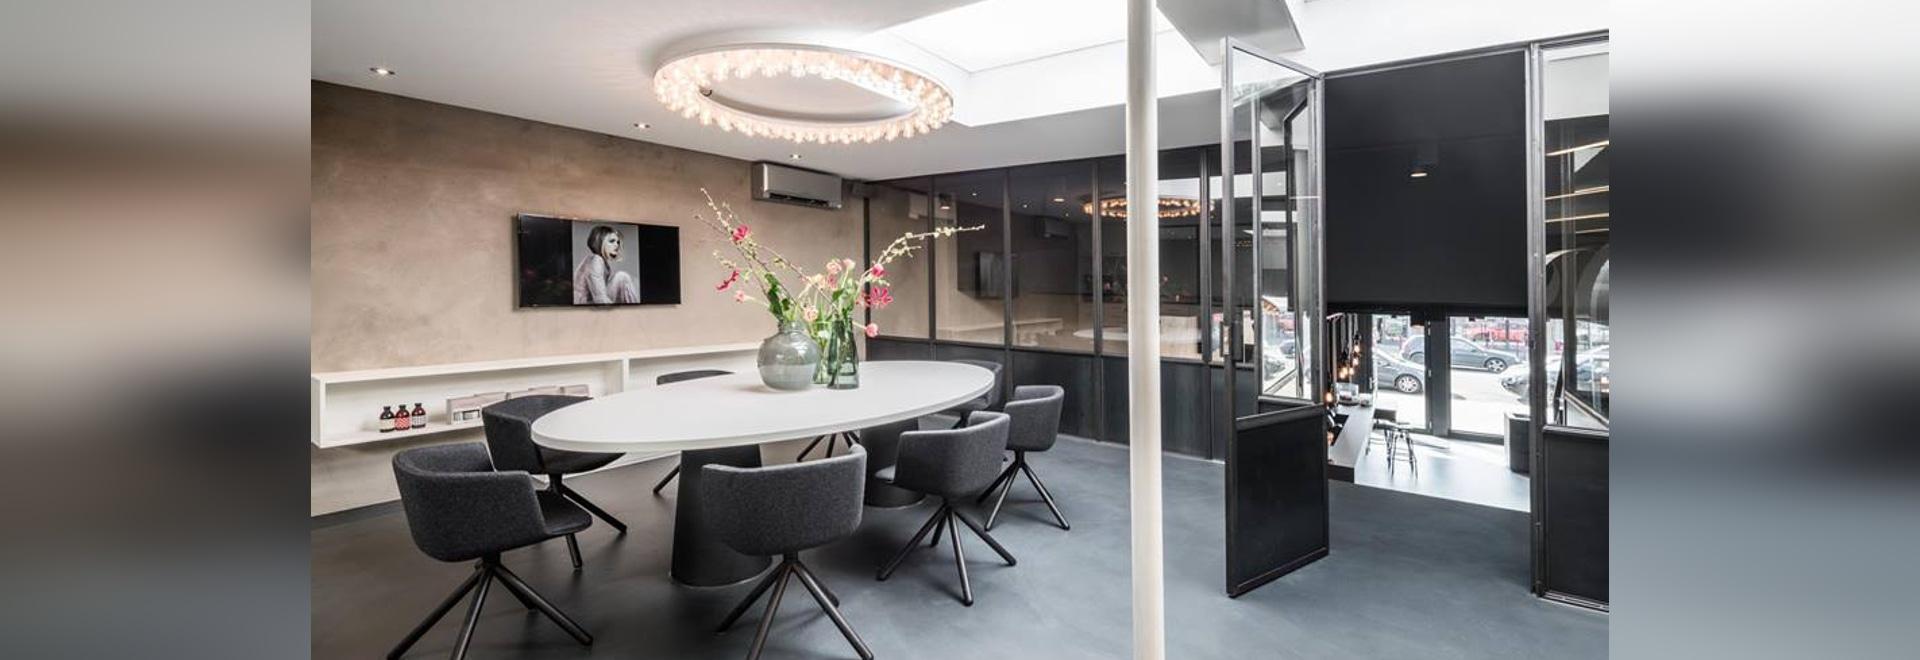 Halo lights brightening Puur Stijl beauty salon